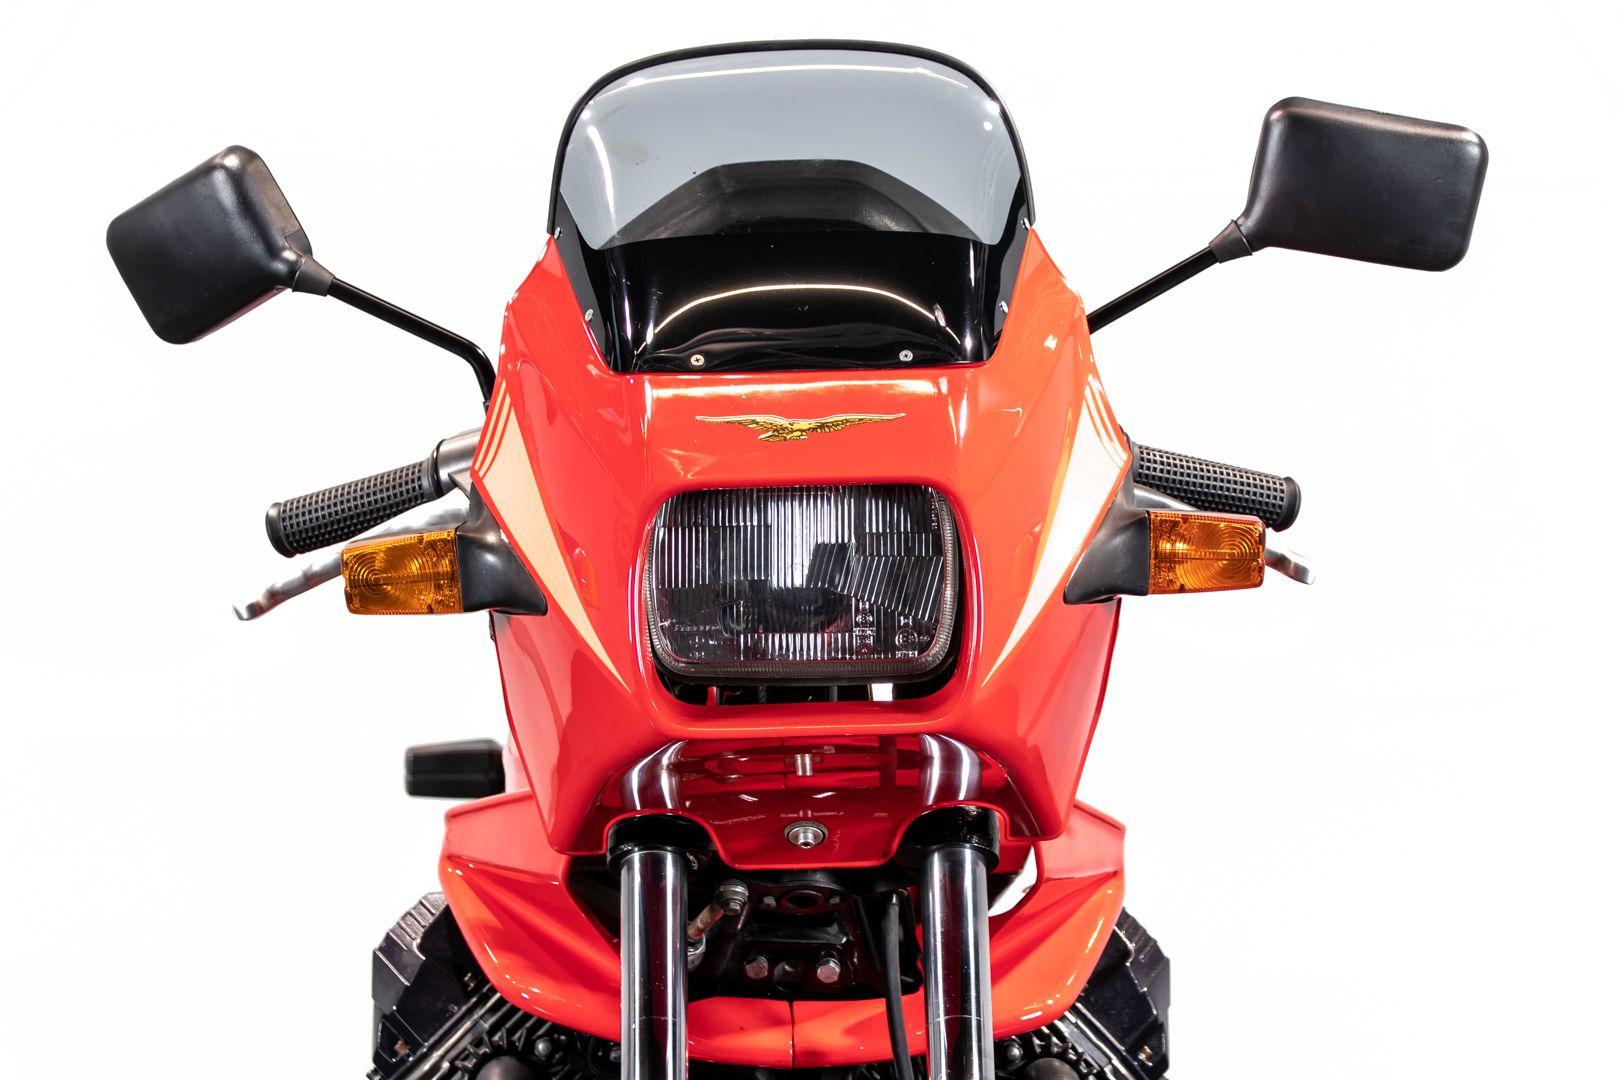 1985 Moto Guzzi le mans 1000 57512